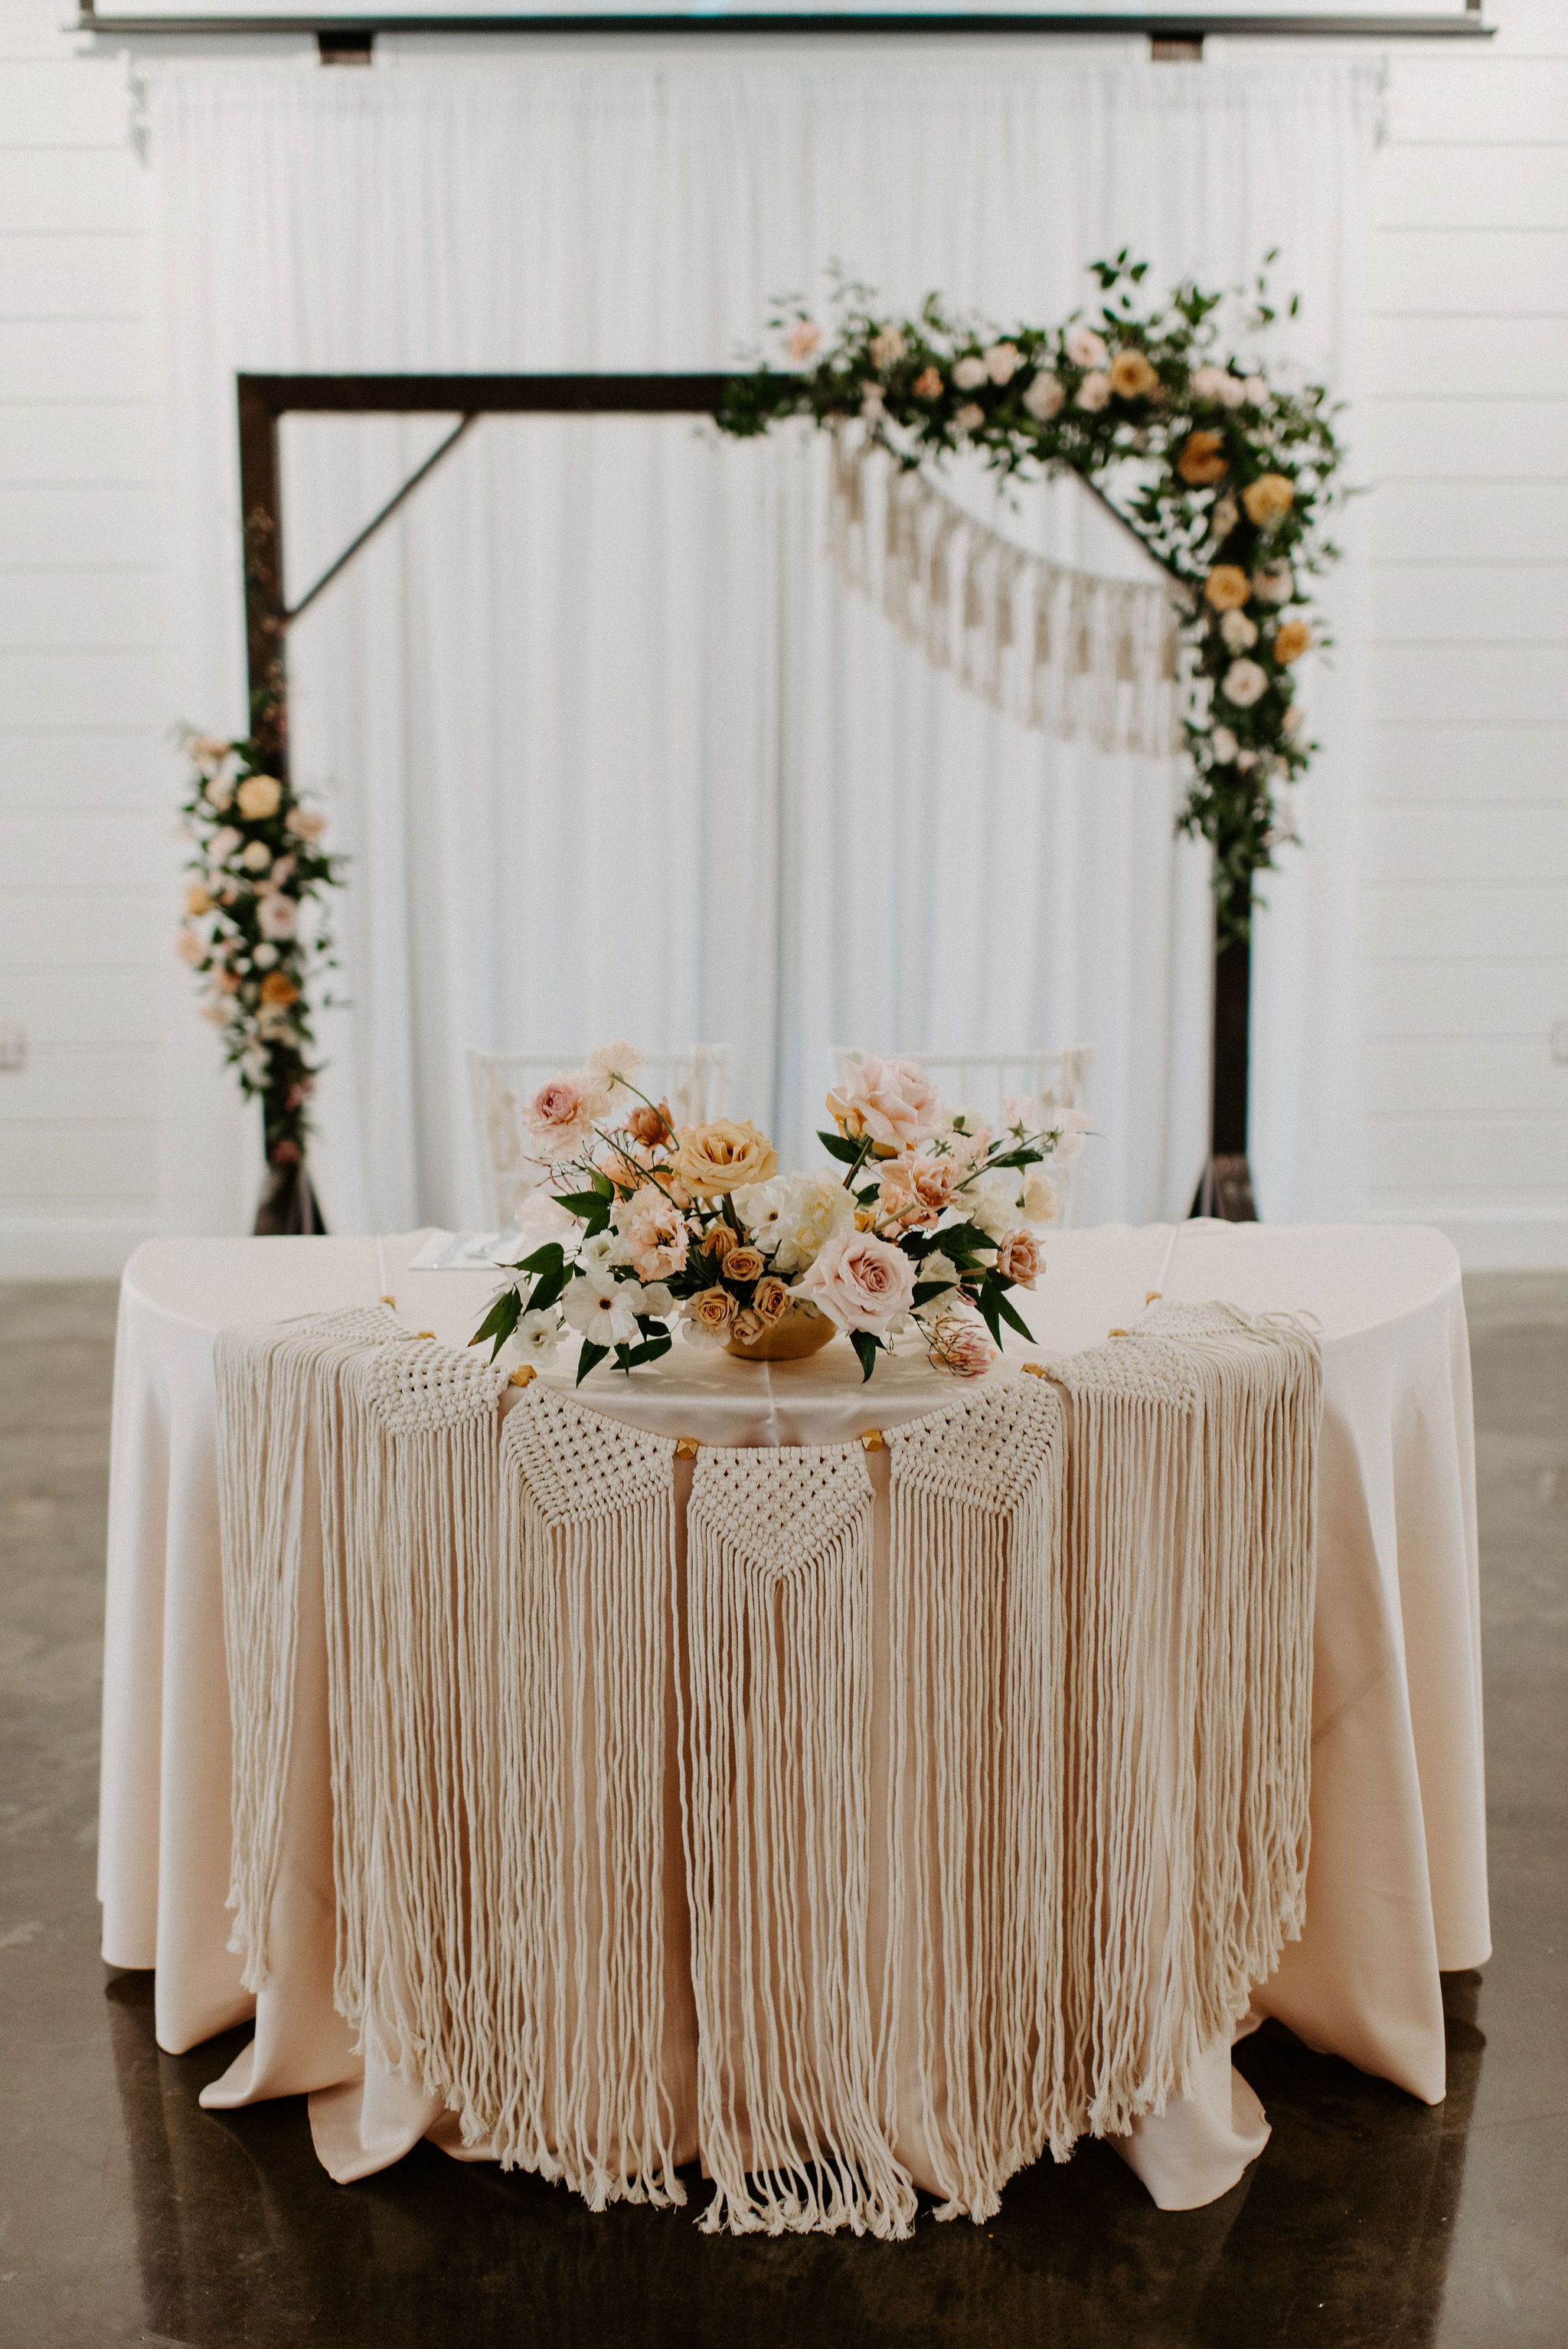 Dream Point Ranch Tulsa's White Barn Wedding Venue 3.jpg